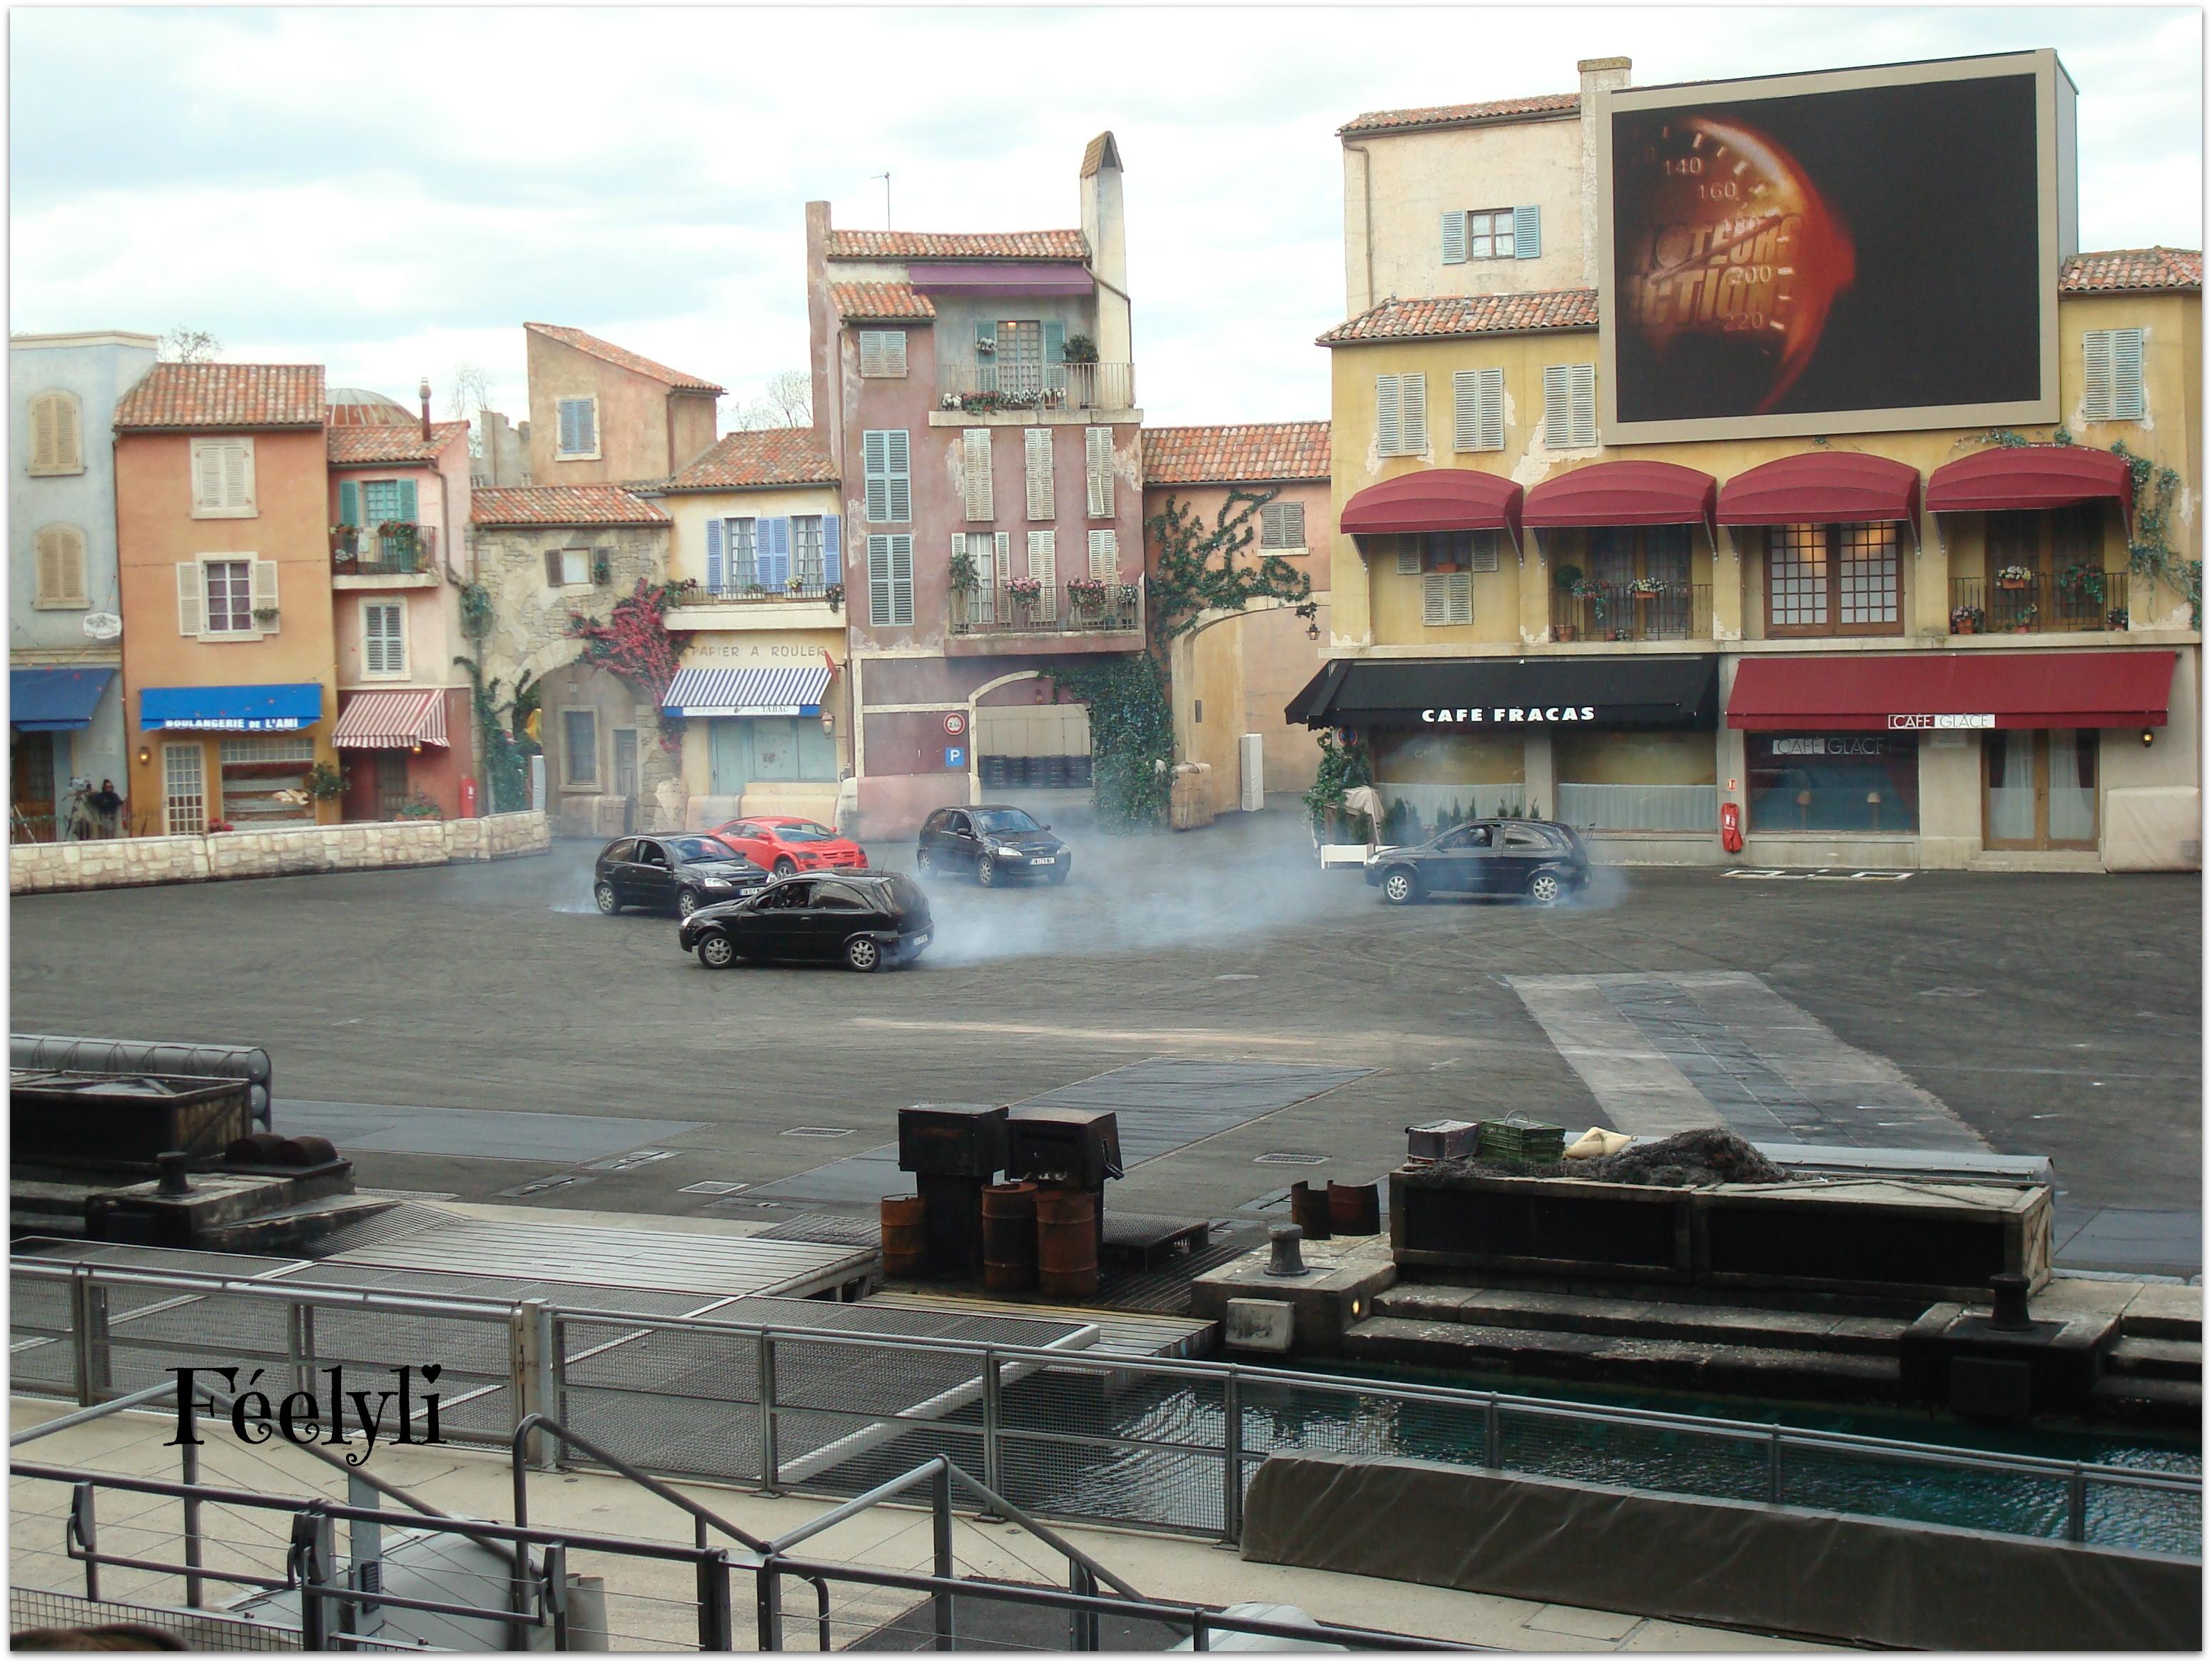 Disneyland paris f elyli for Moteur hotel